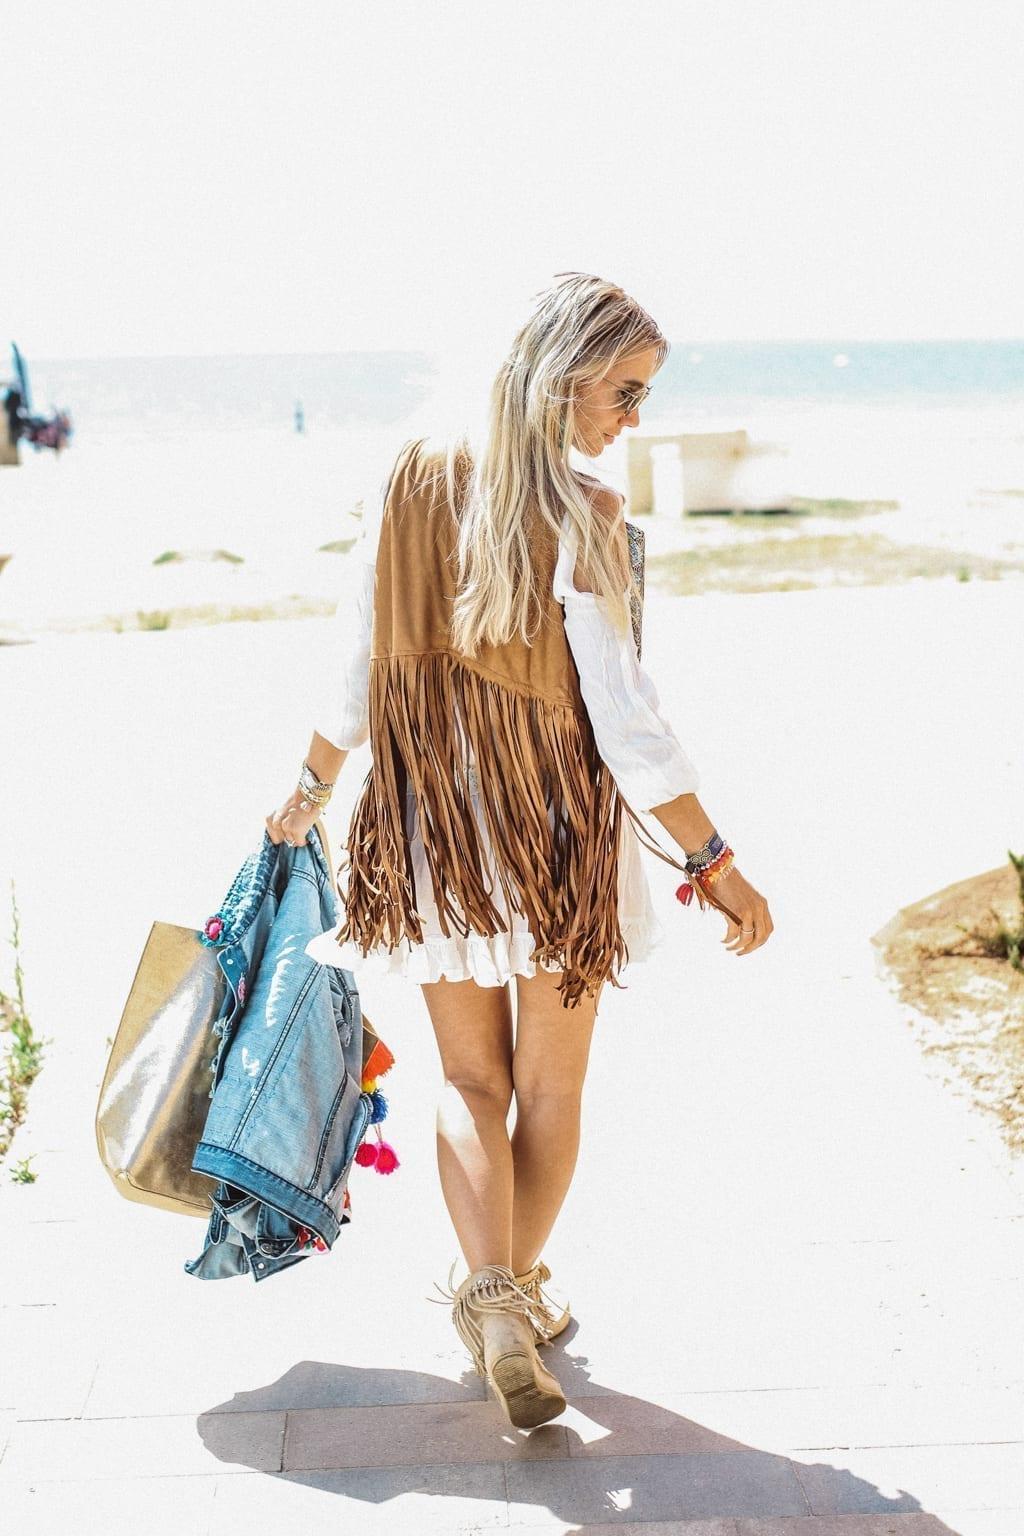 CK1605_Constantly-K-Karin-Kaswurm-Georg-Teigl-Ibiza-Holiday-Spain-Blog-Street-Style-Fashion-Boho-Chic-Beach-Style-7708